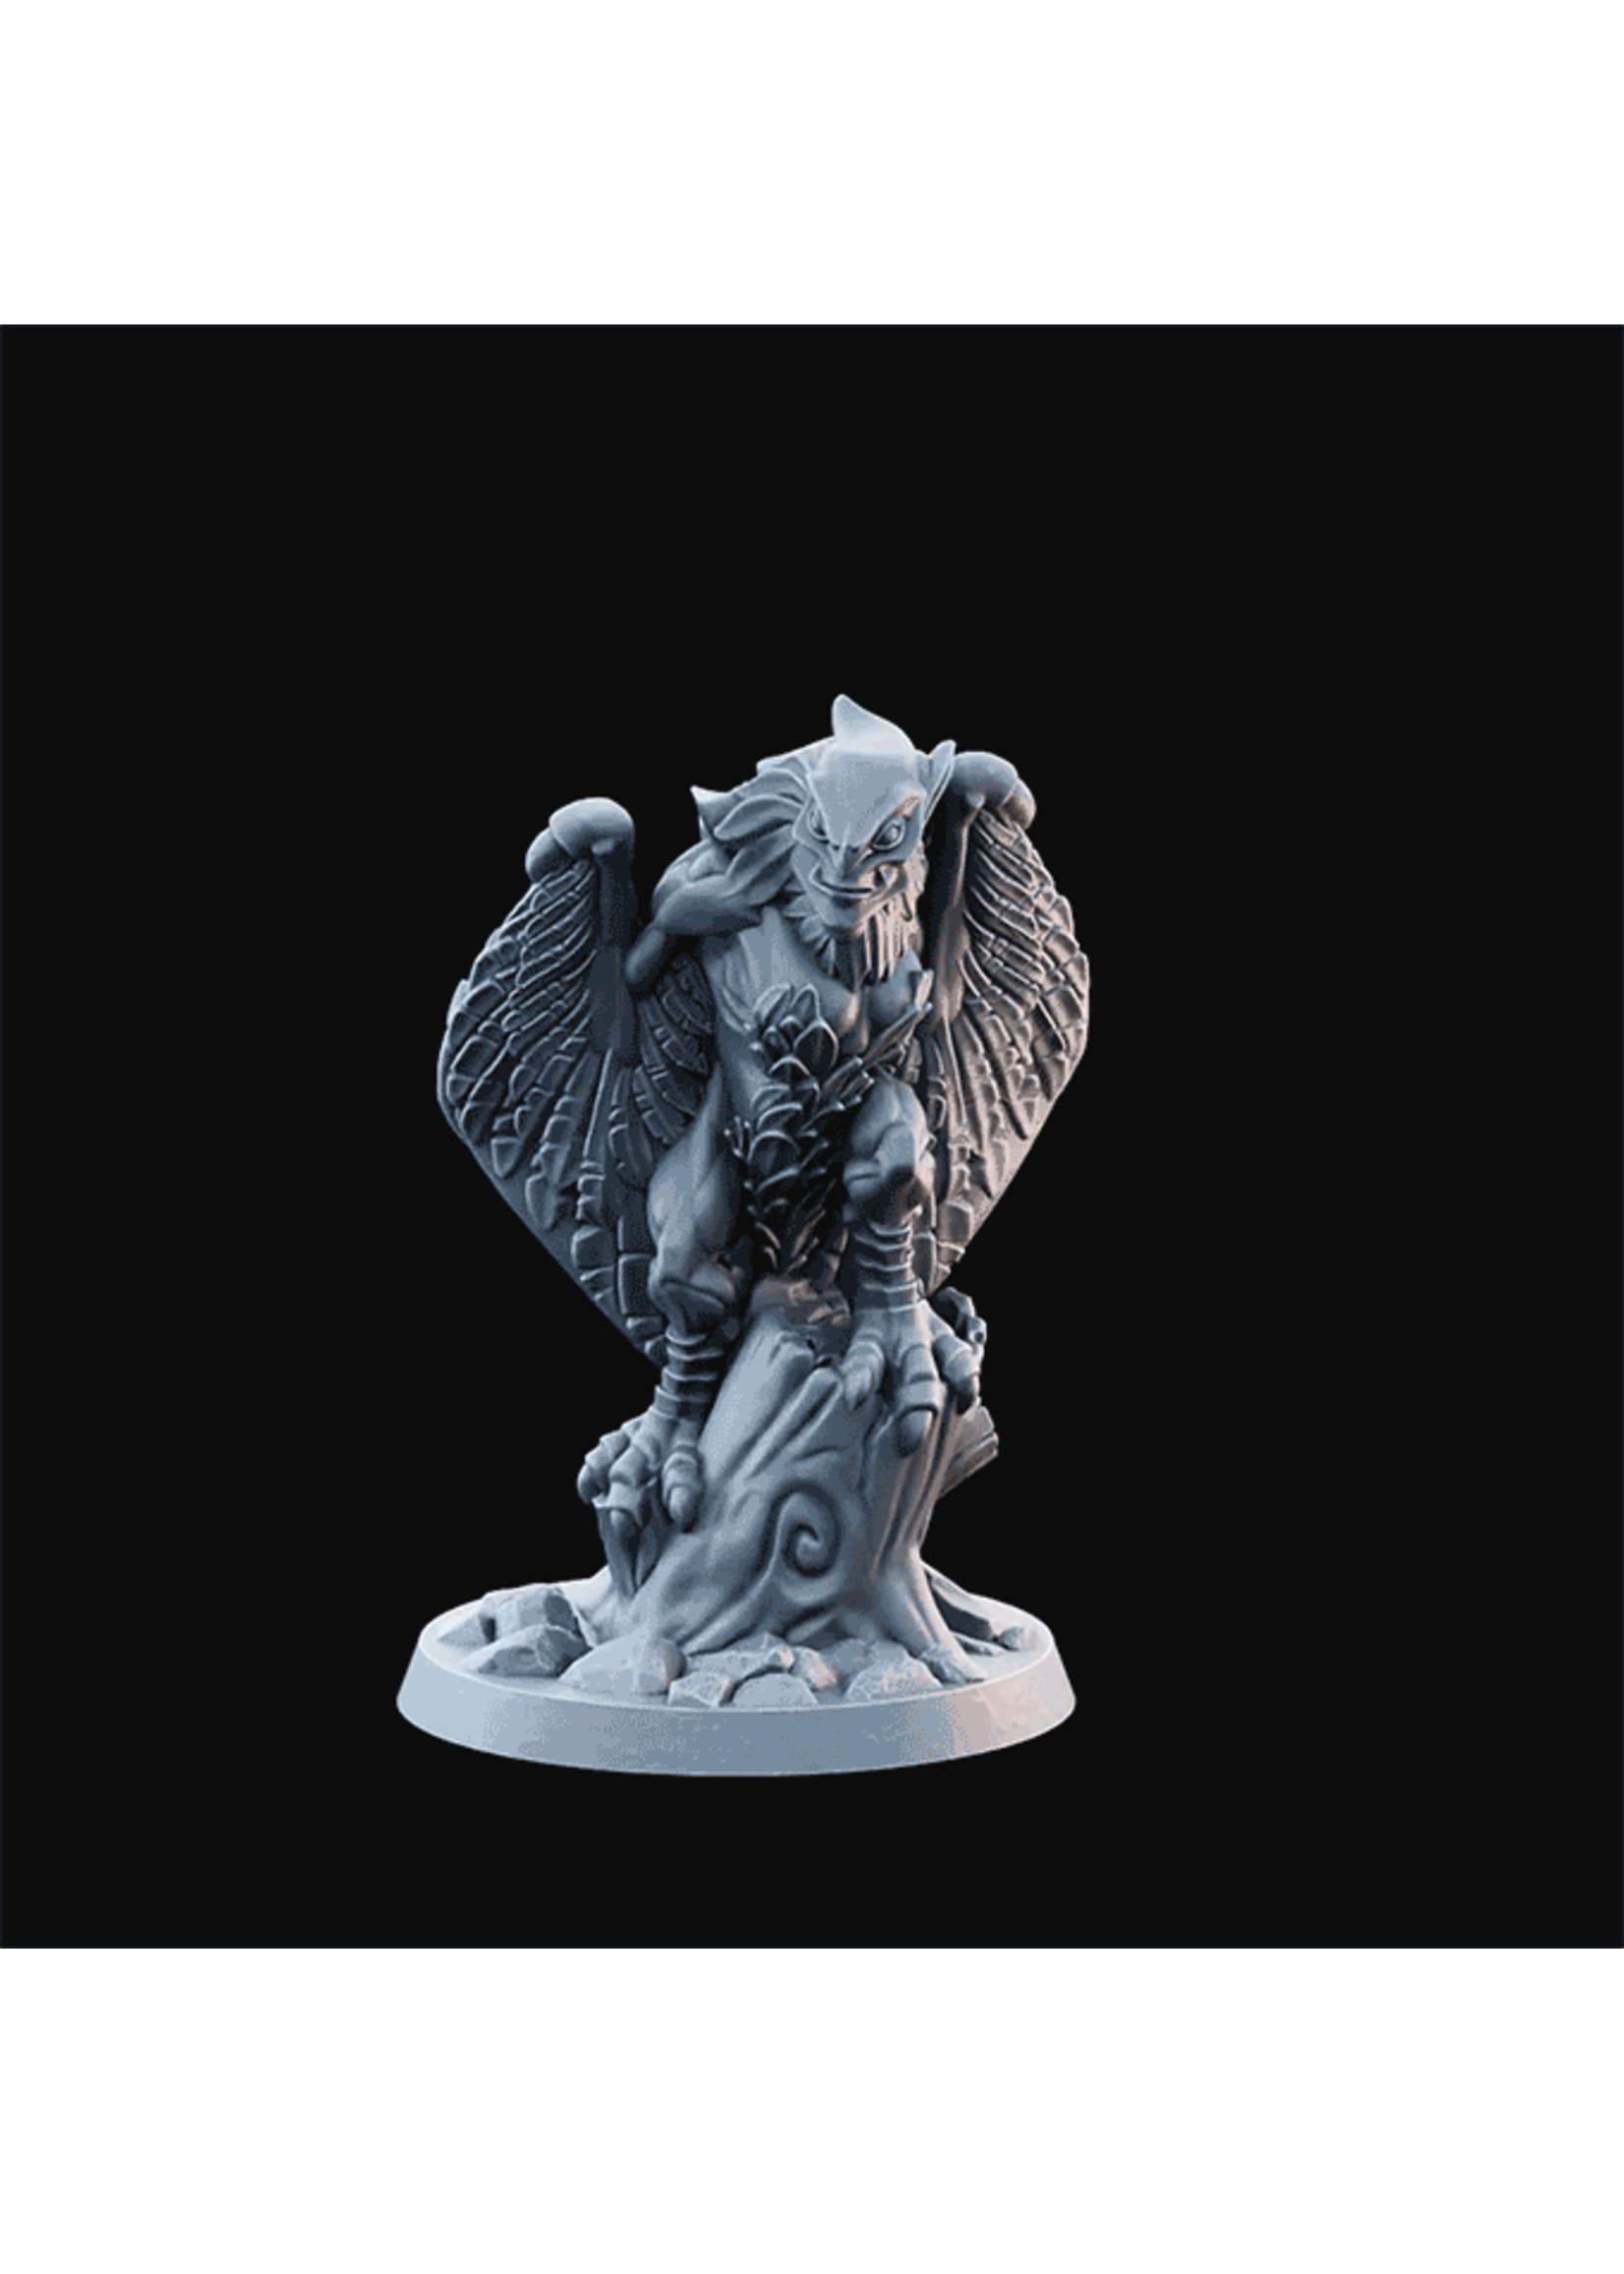 3D Printed Miniature - Harpy03  - Dungeons & Dragons - Desolate Plains KS